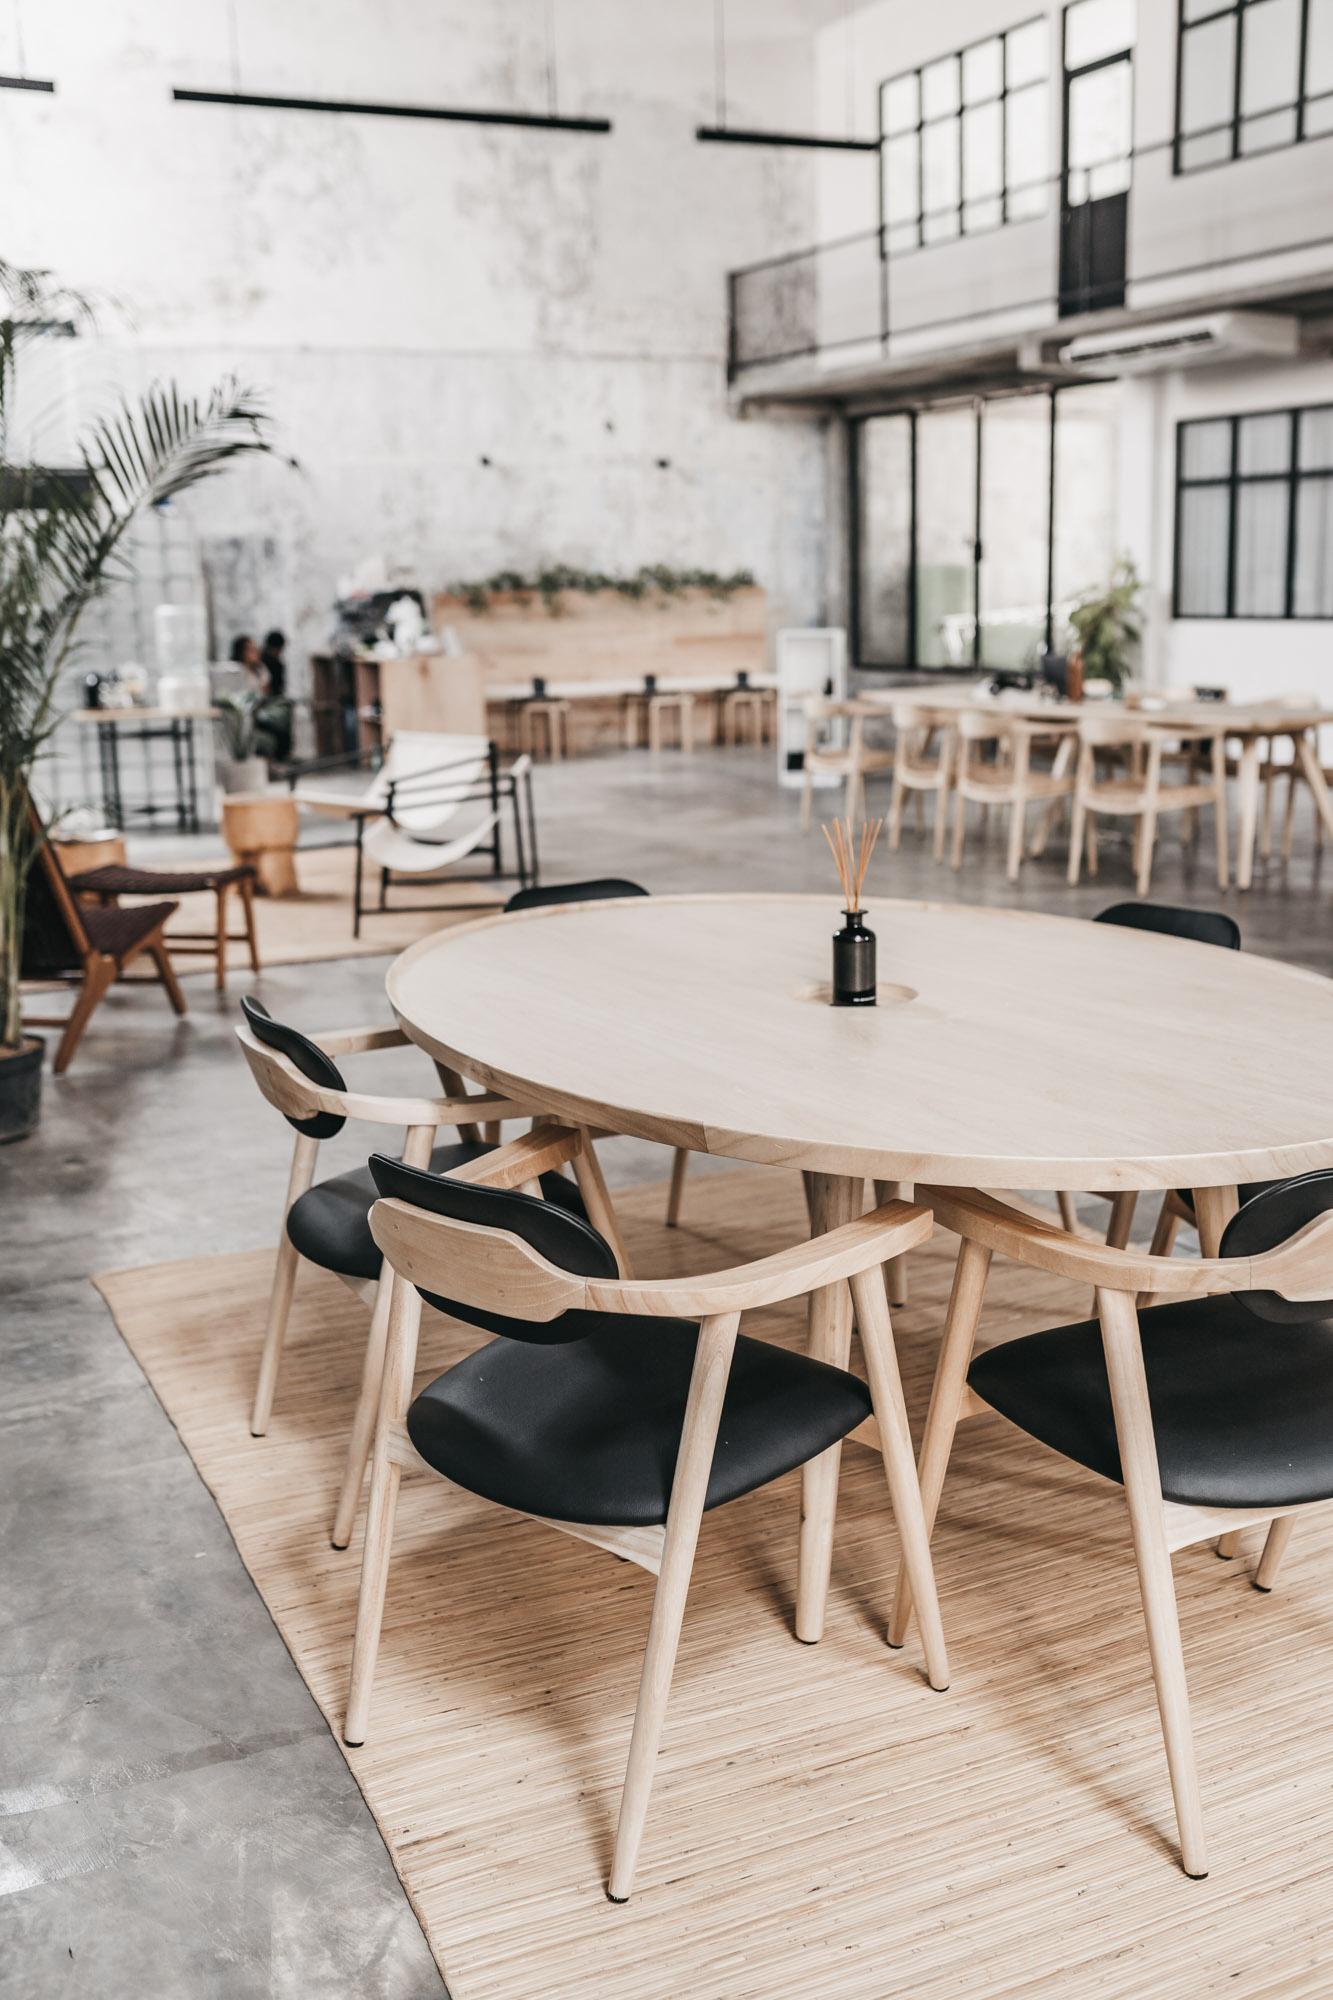 keira-mason-kinship-studio-furniture-design.jpg